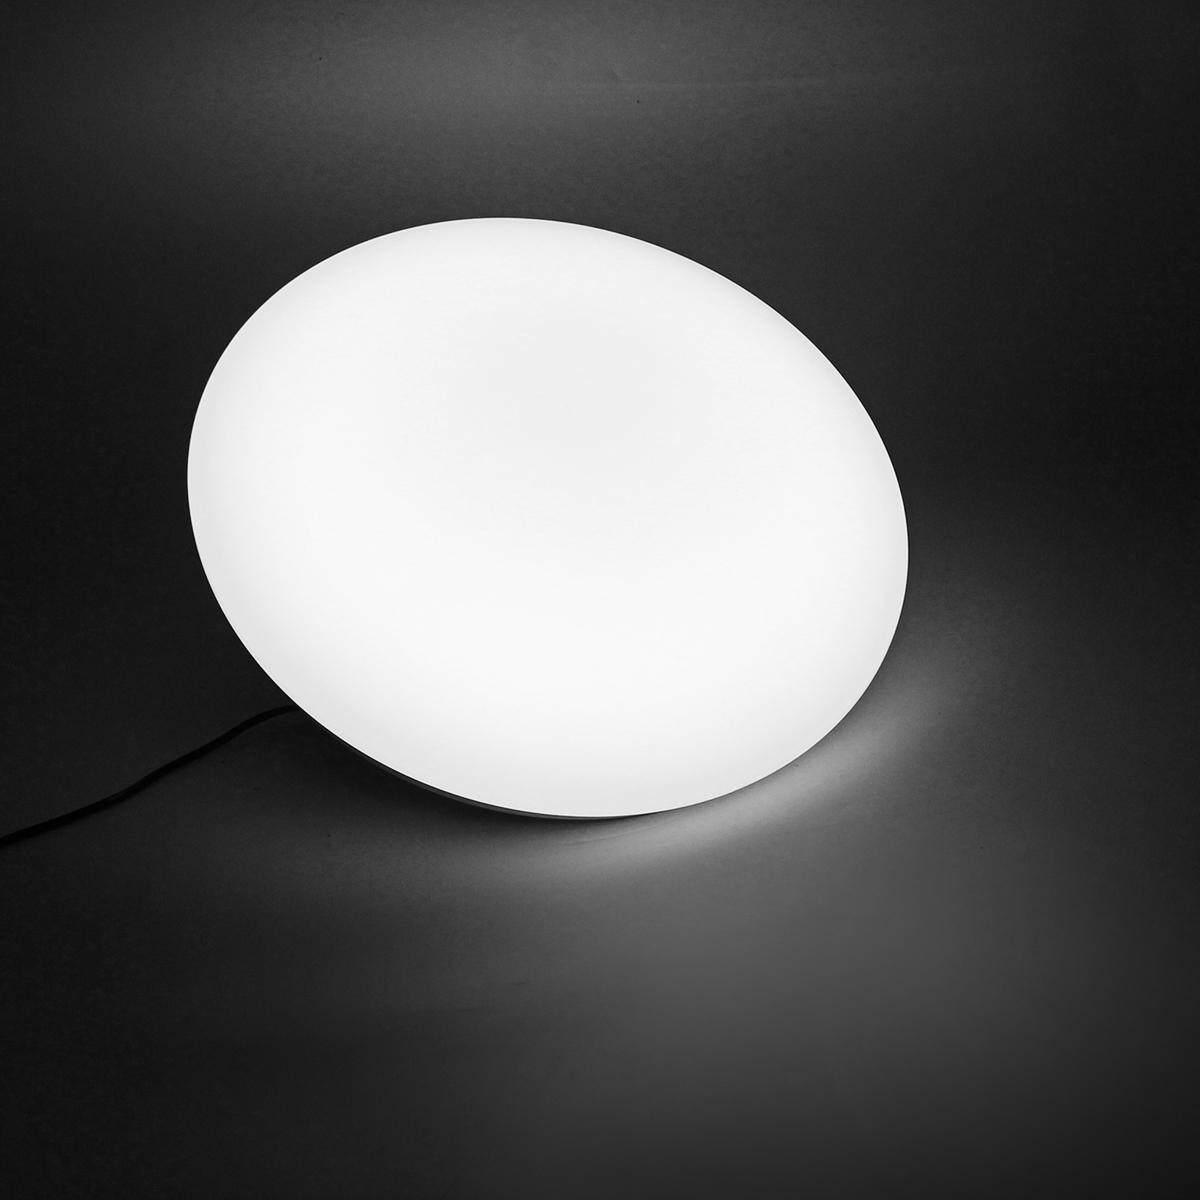 [18W] LED Ceiling Down Light Bathroom kitchen Living Lamp Day White Flush Mounted